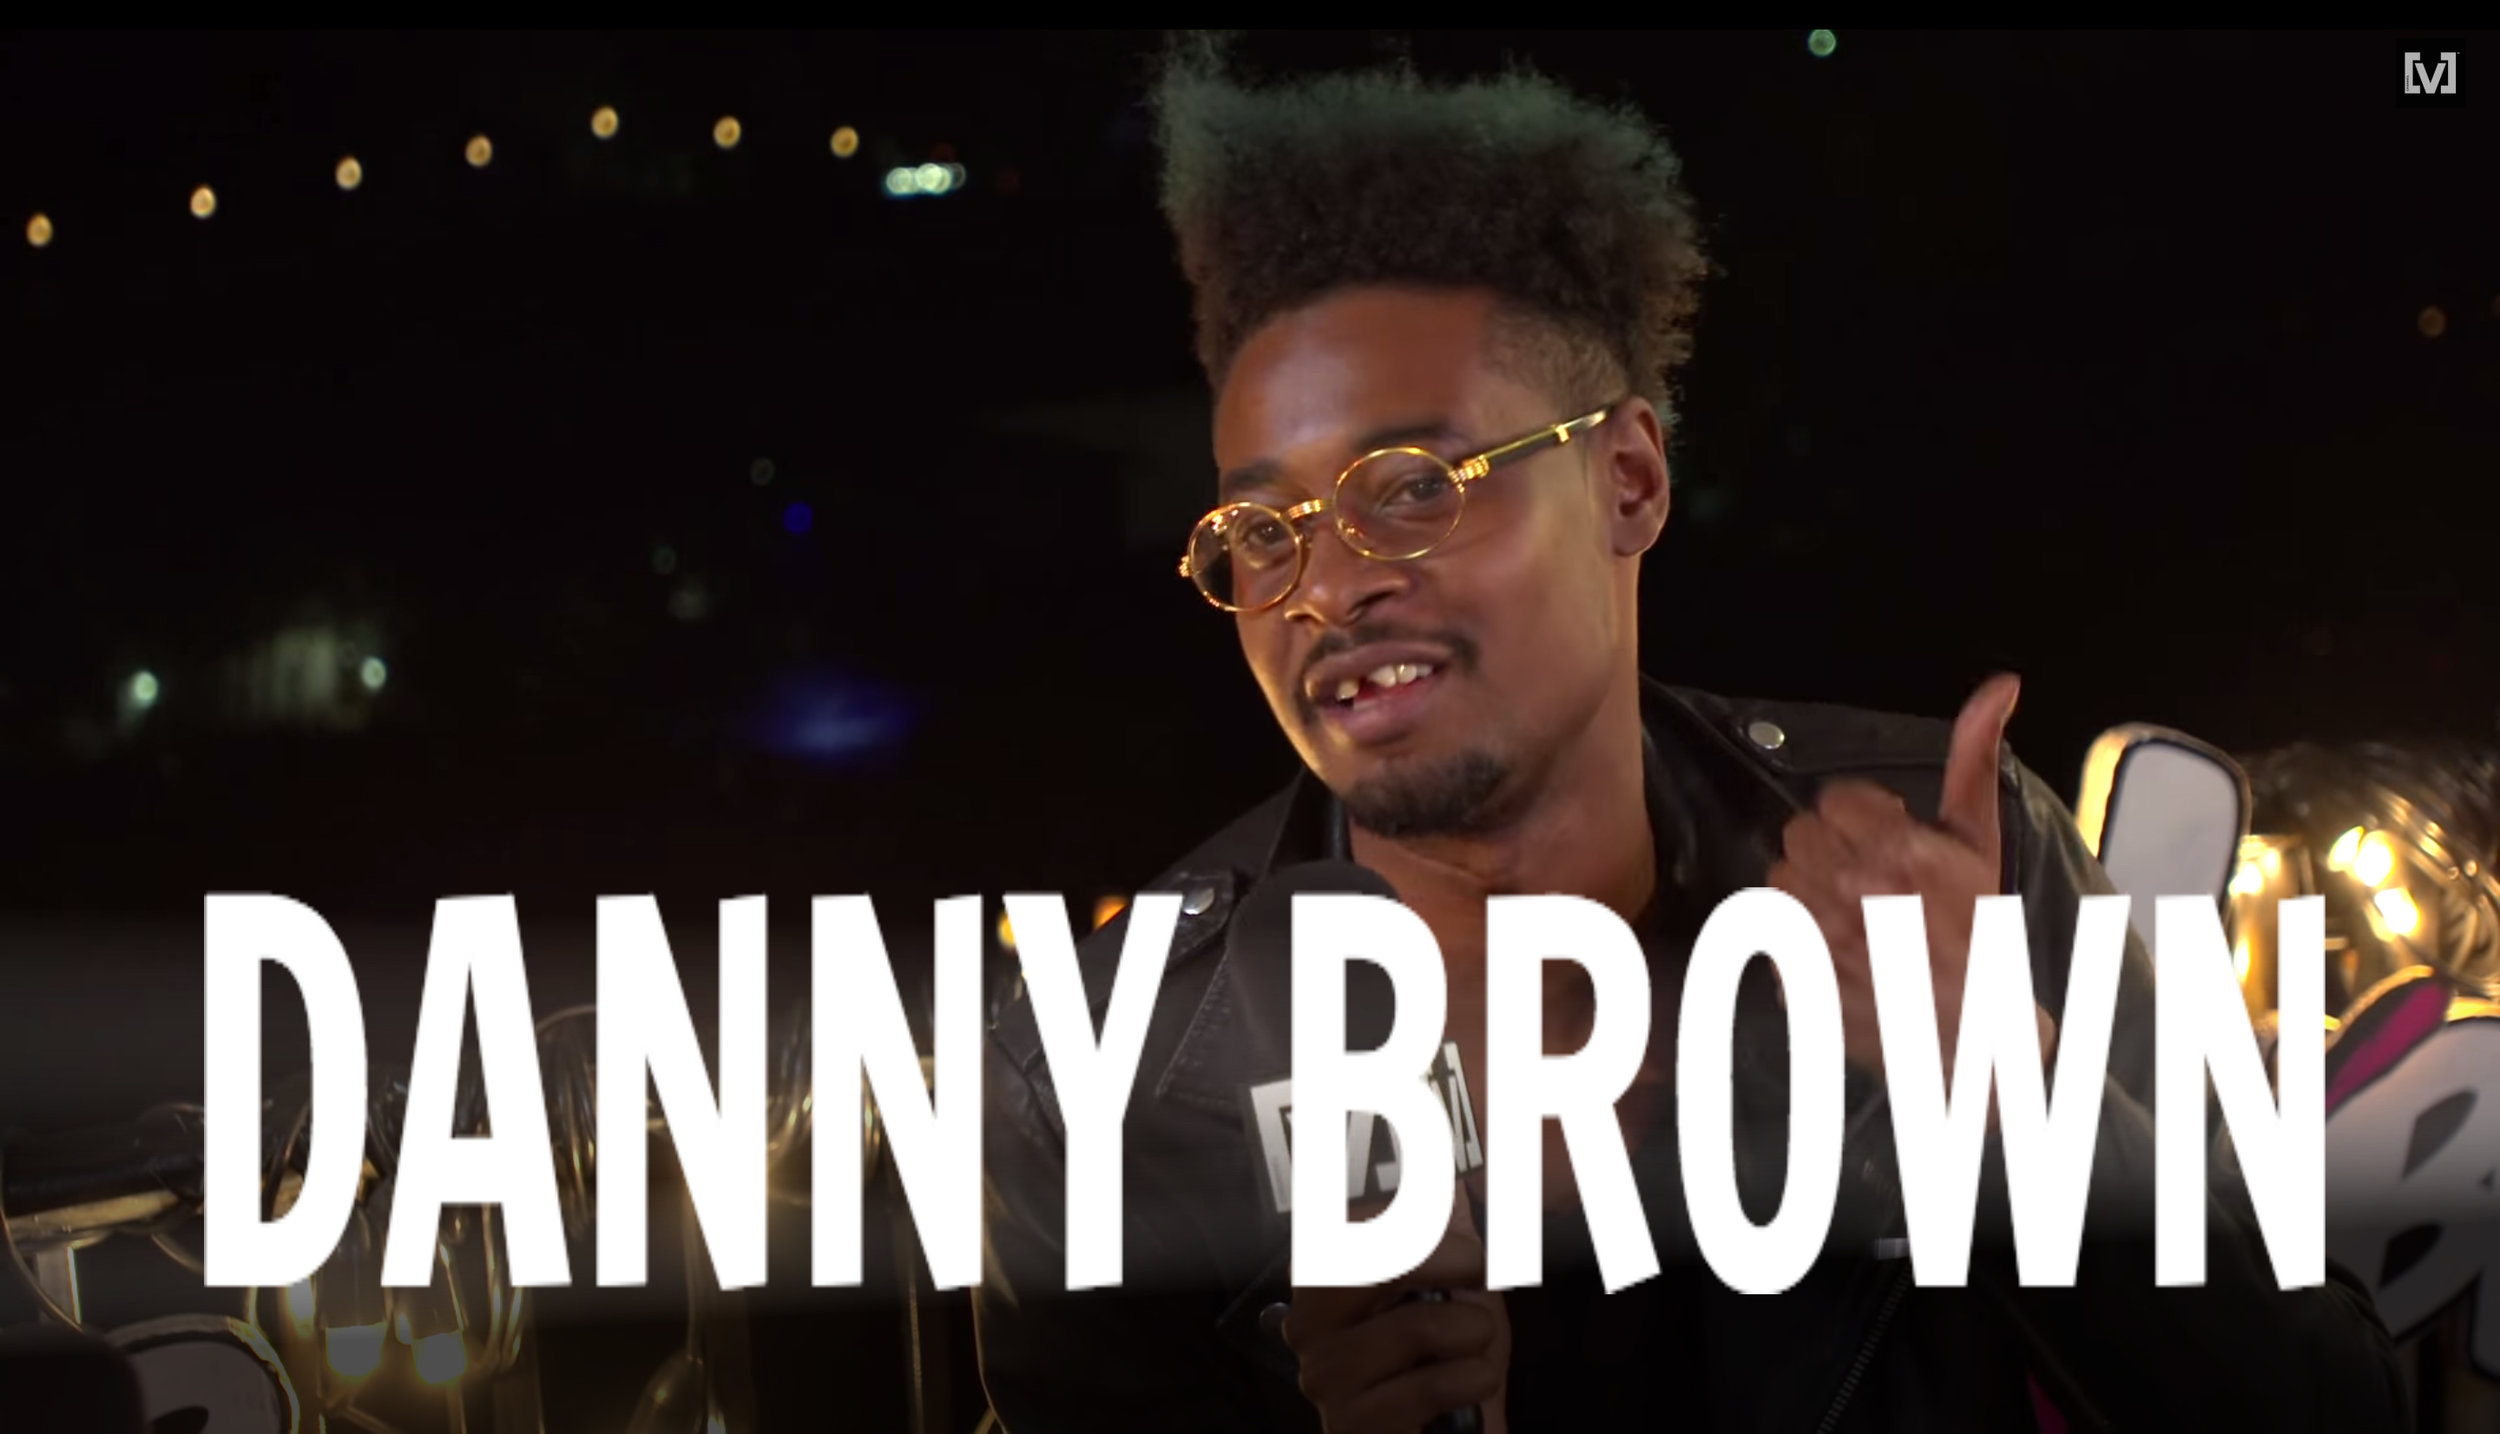 danny brown webpic.jpg